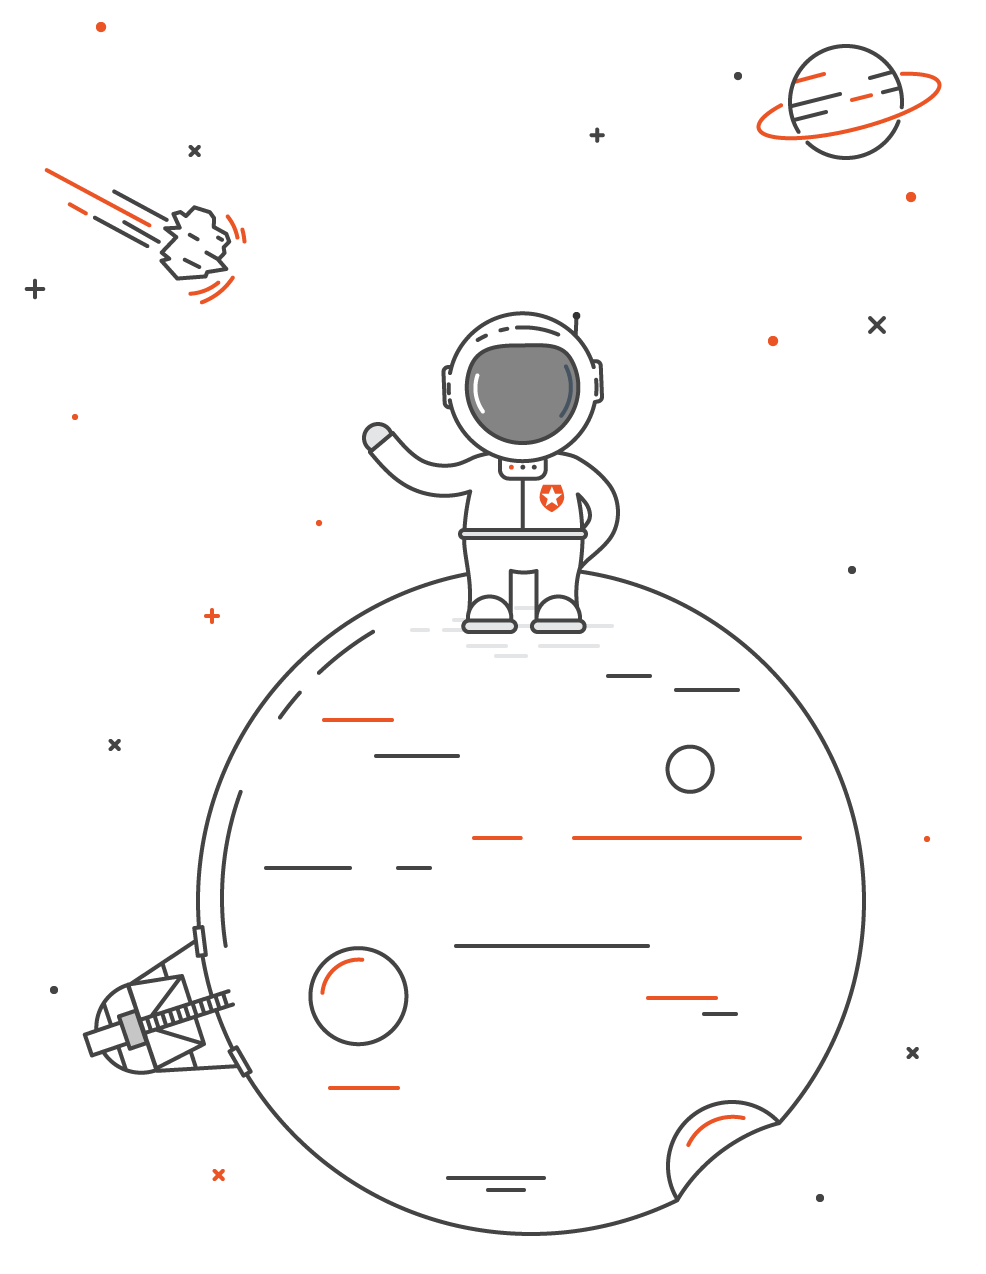 Auth0 Ambassador Program astronaut icon